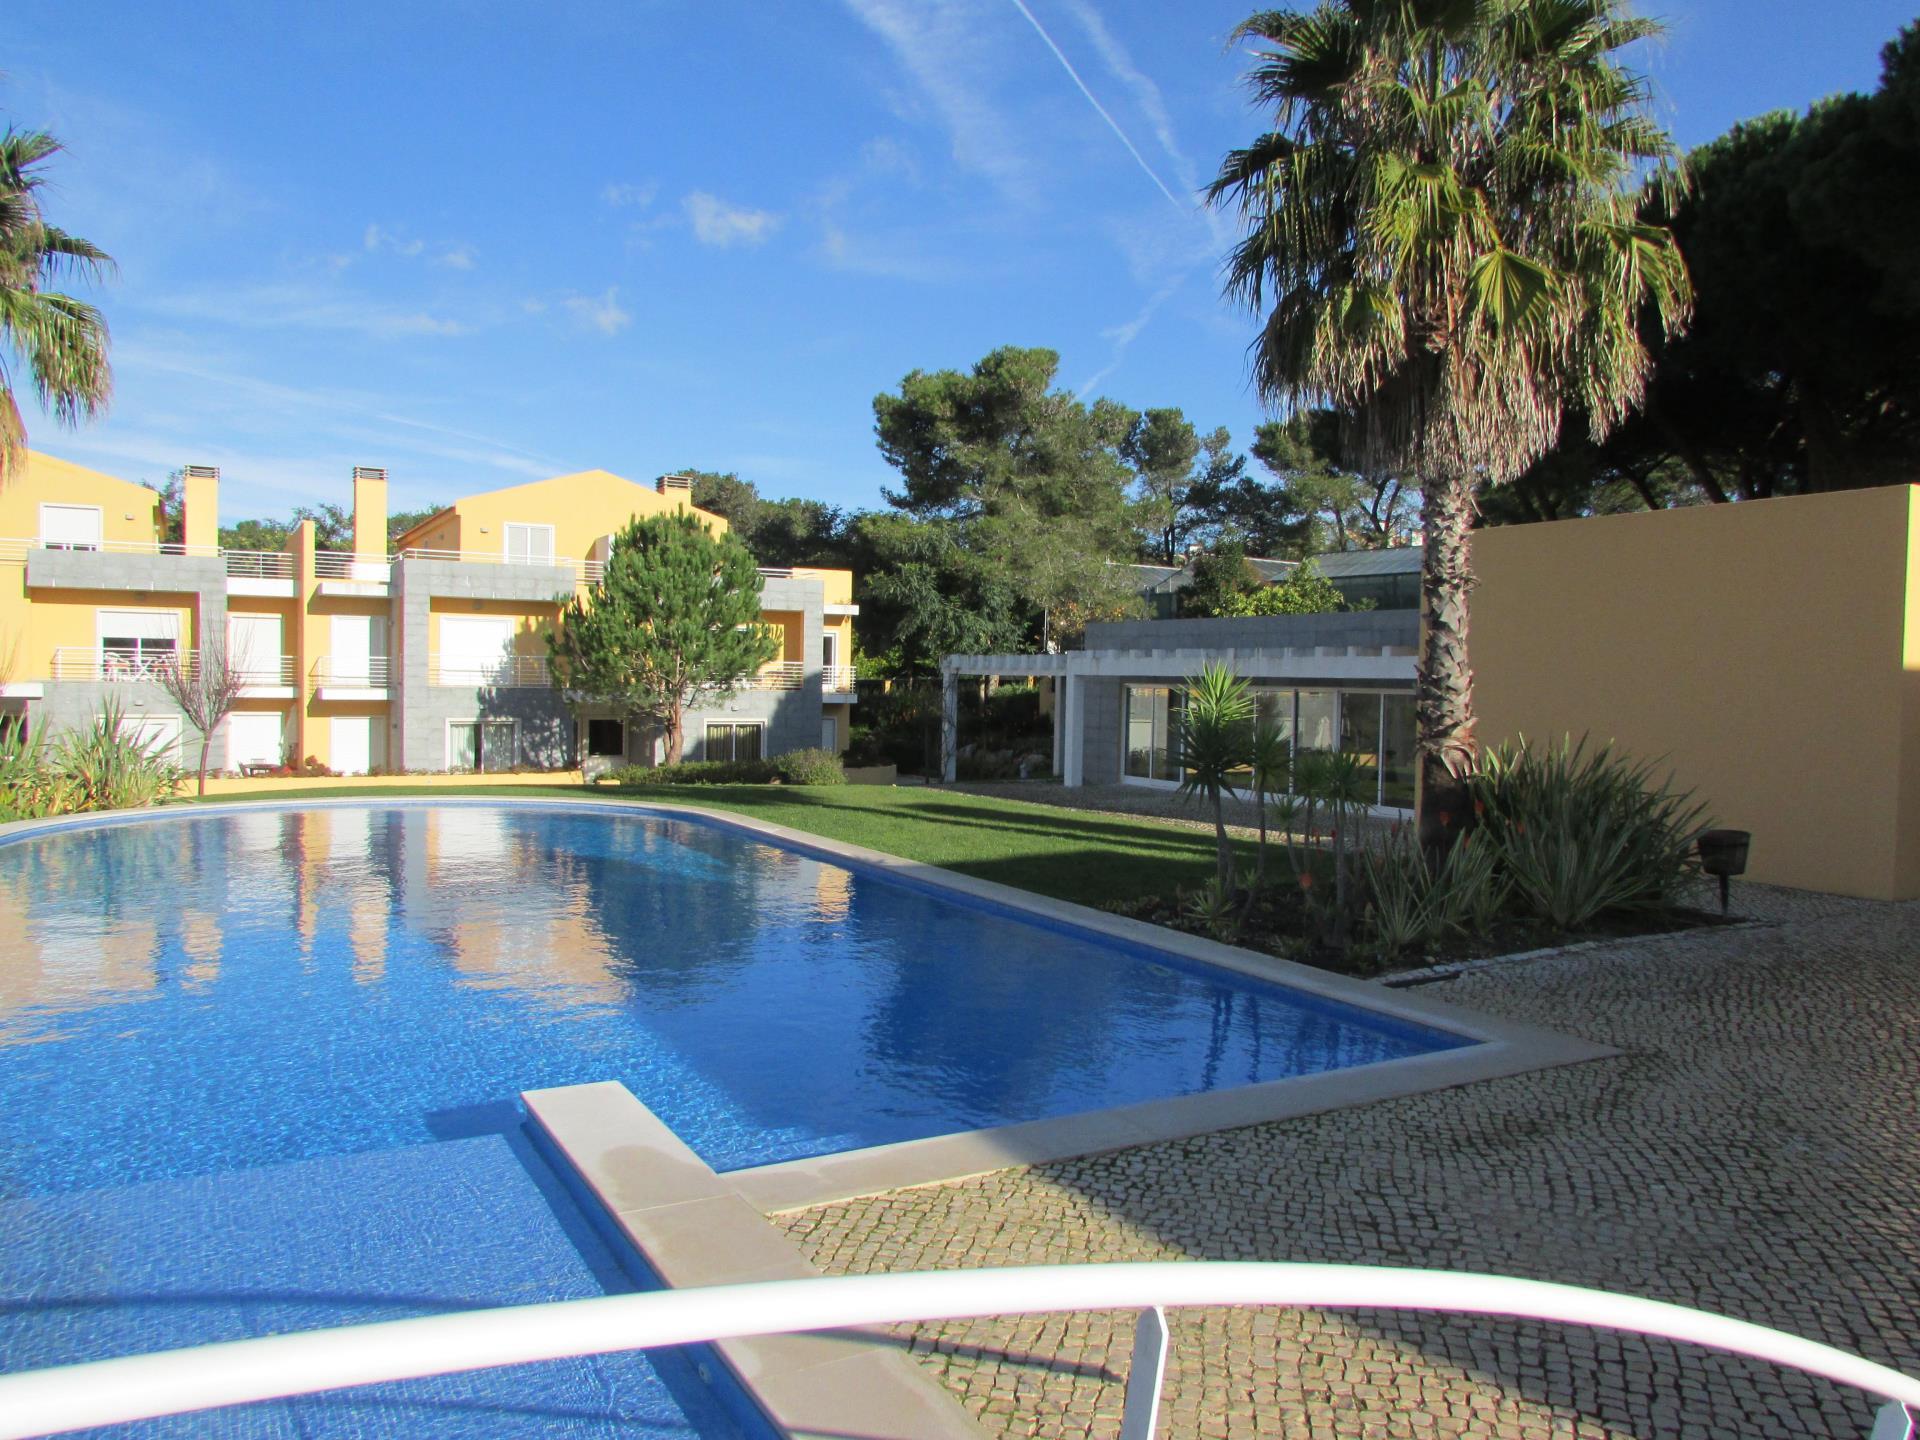 Квартира для того Продажа на Flat, 2 bedrooms, for Sale Birre, Cascais, Лиссабон Португалия